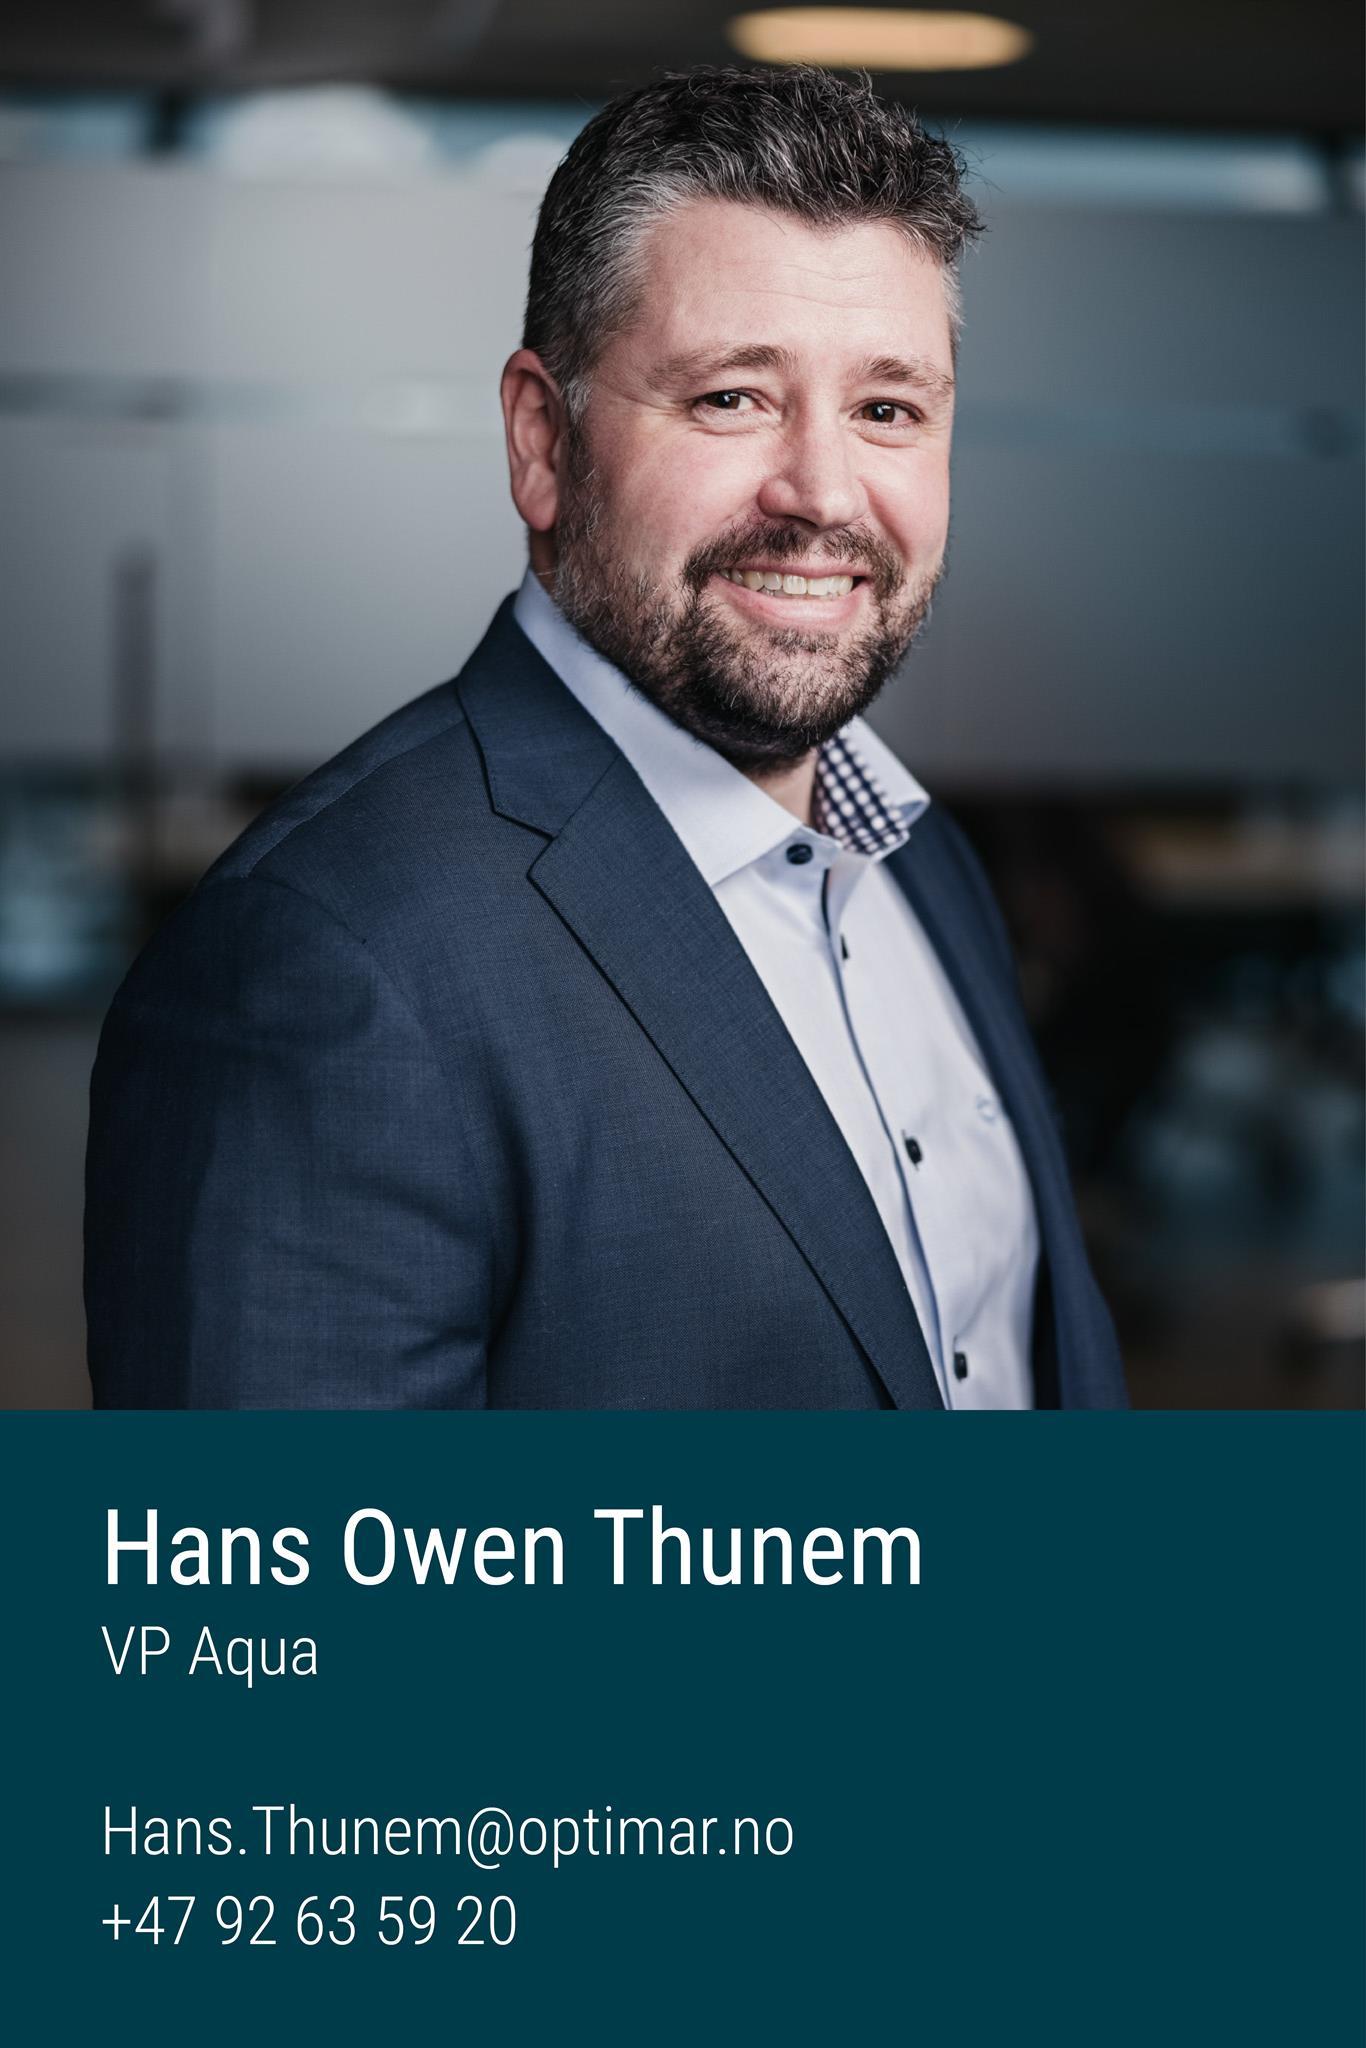 Hans Owen Thunem